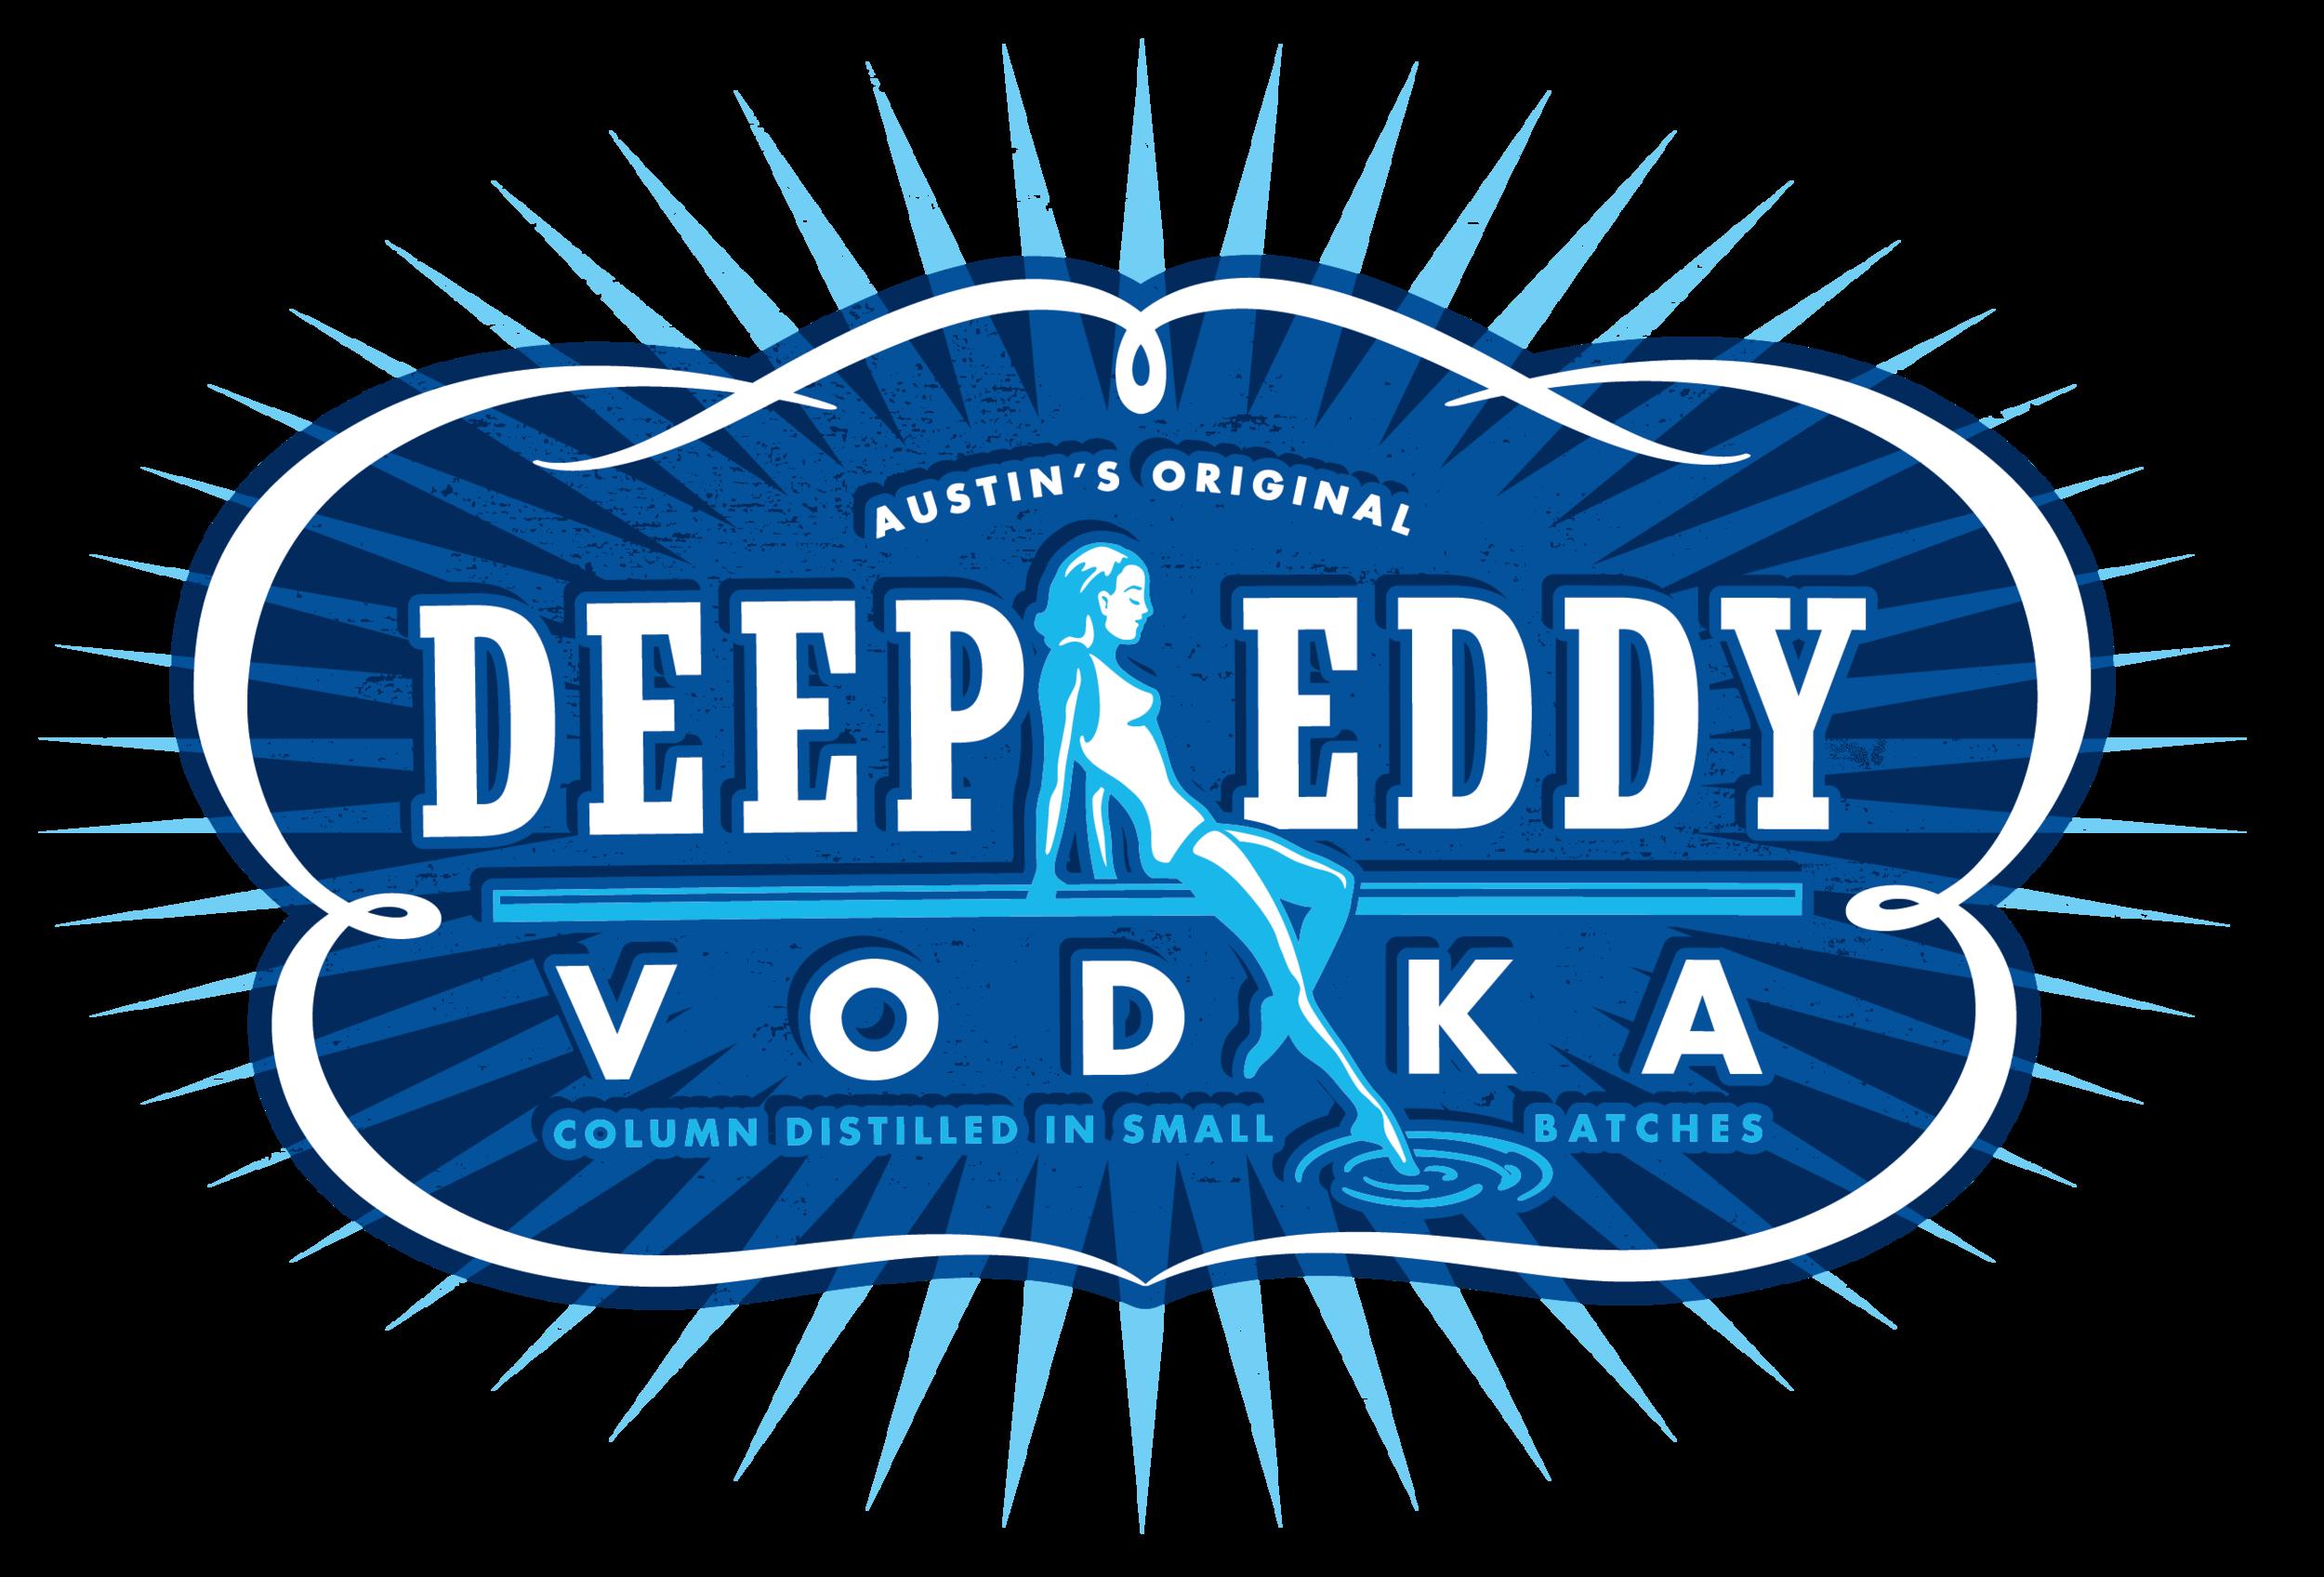 http://www.deepeddyvodka.com/2.0/